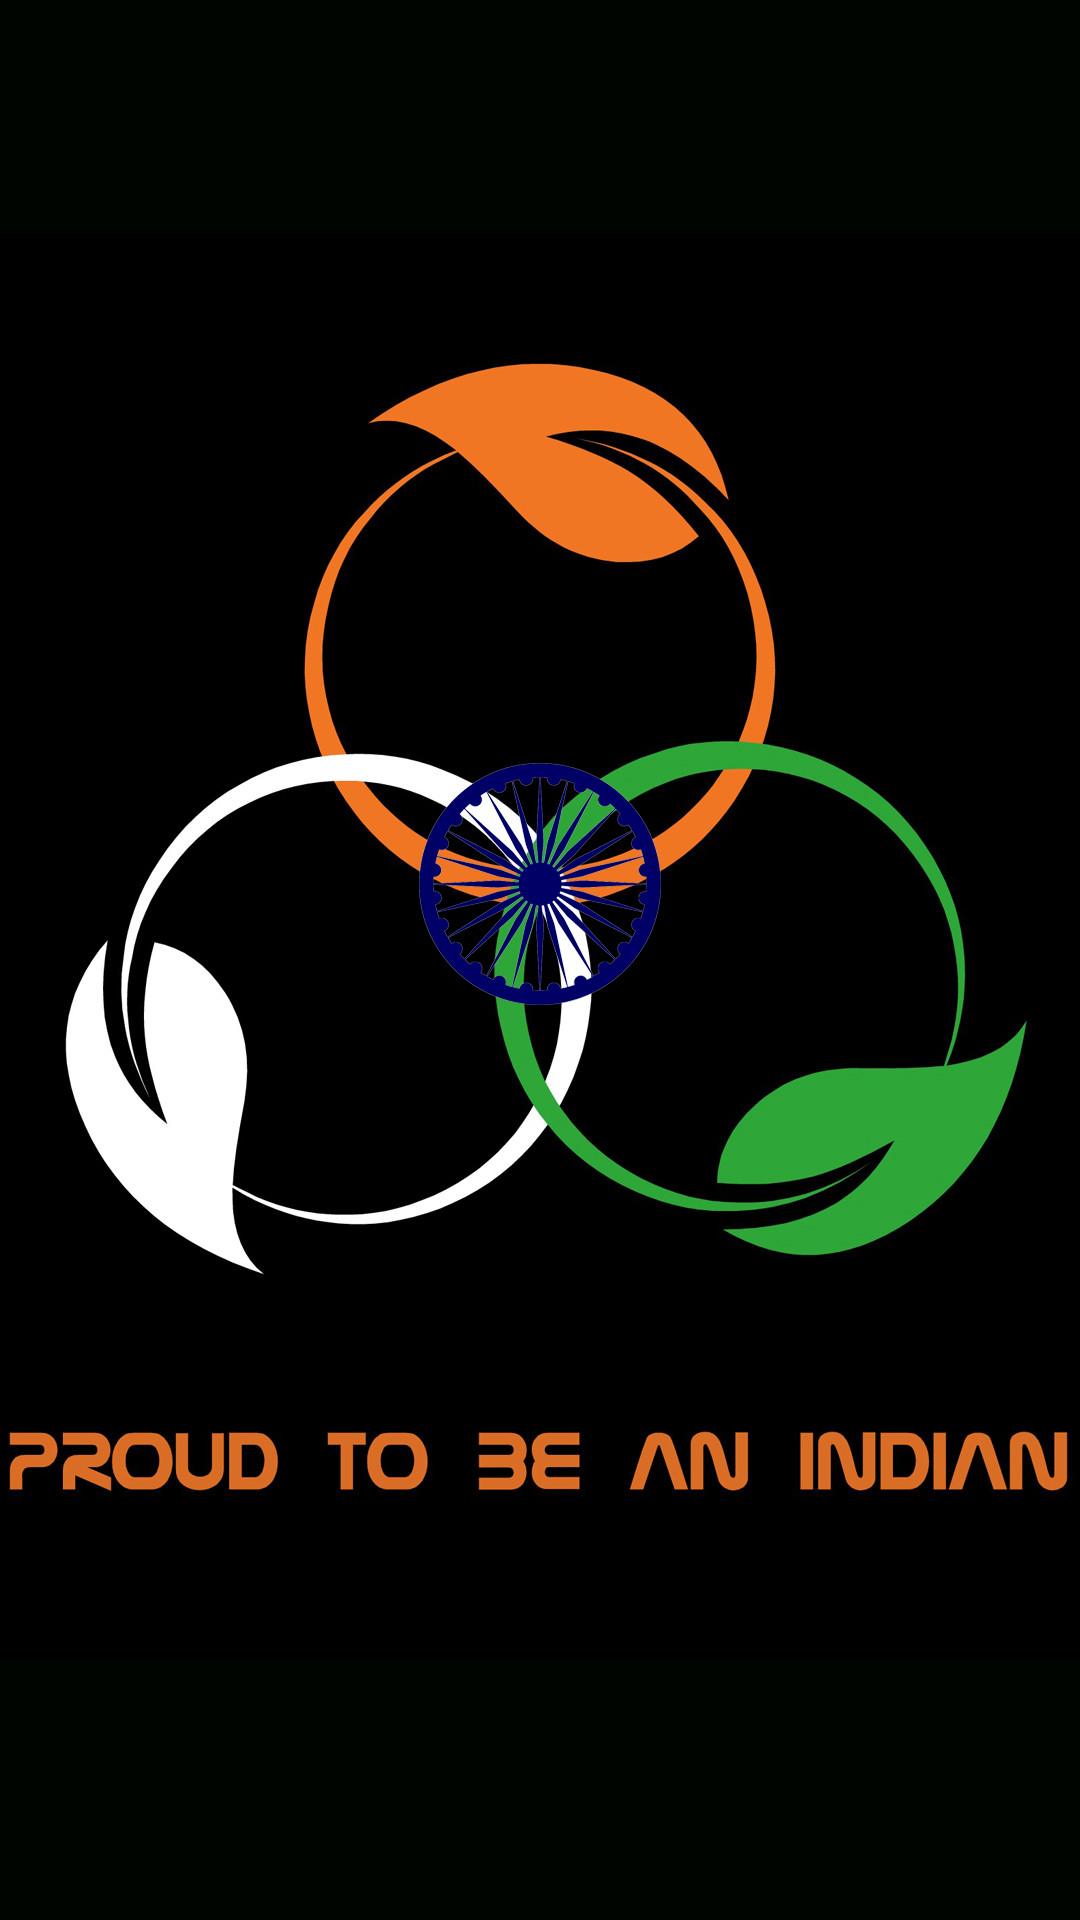 Indian Flag Animation Wallpaper Indian Flag Mobile 3d Wallpaper 2018 72 Images